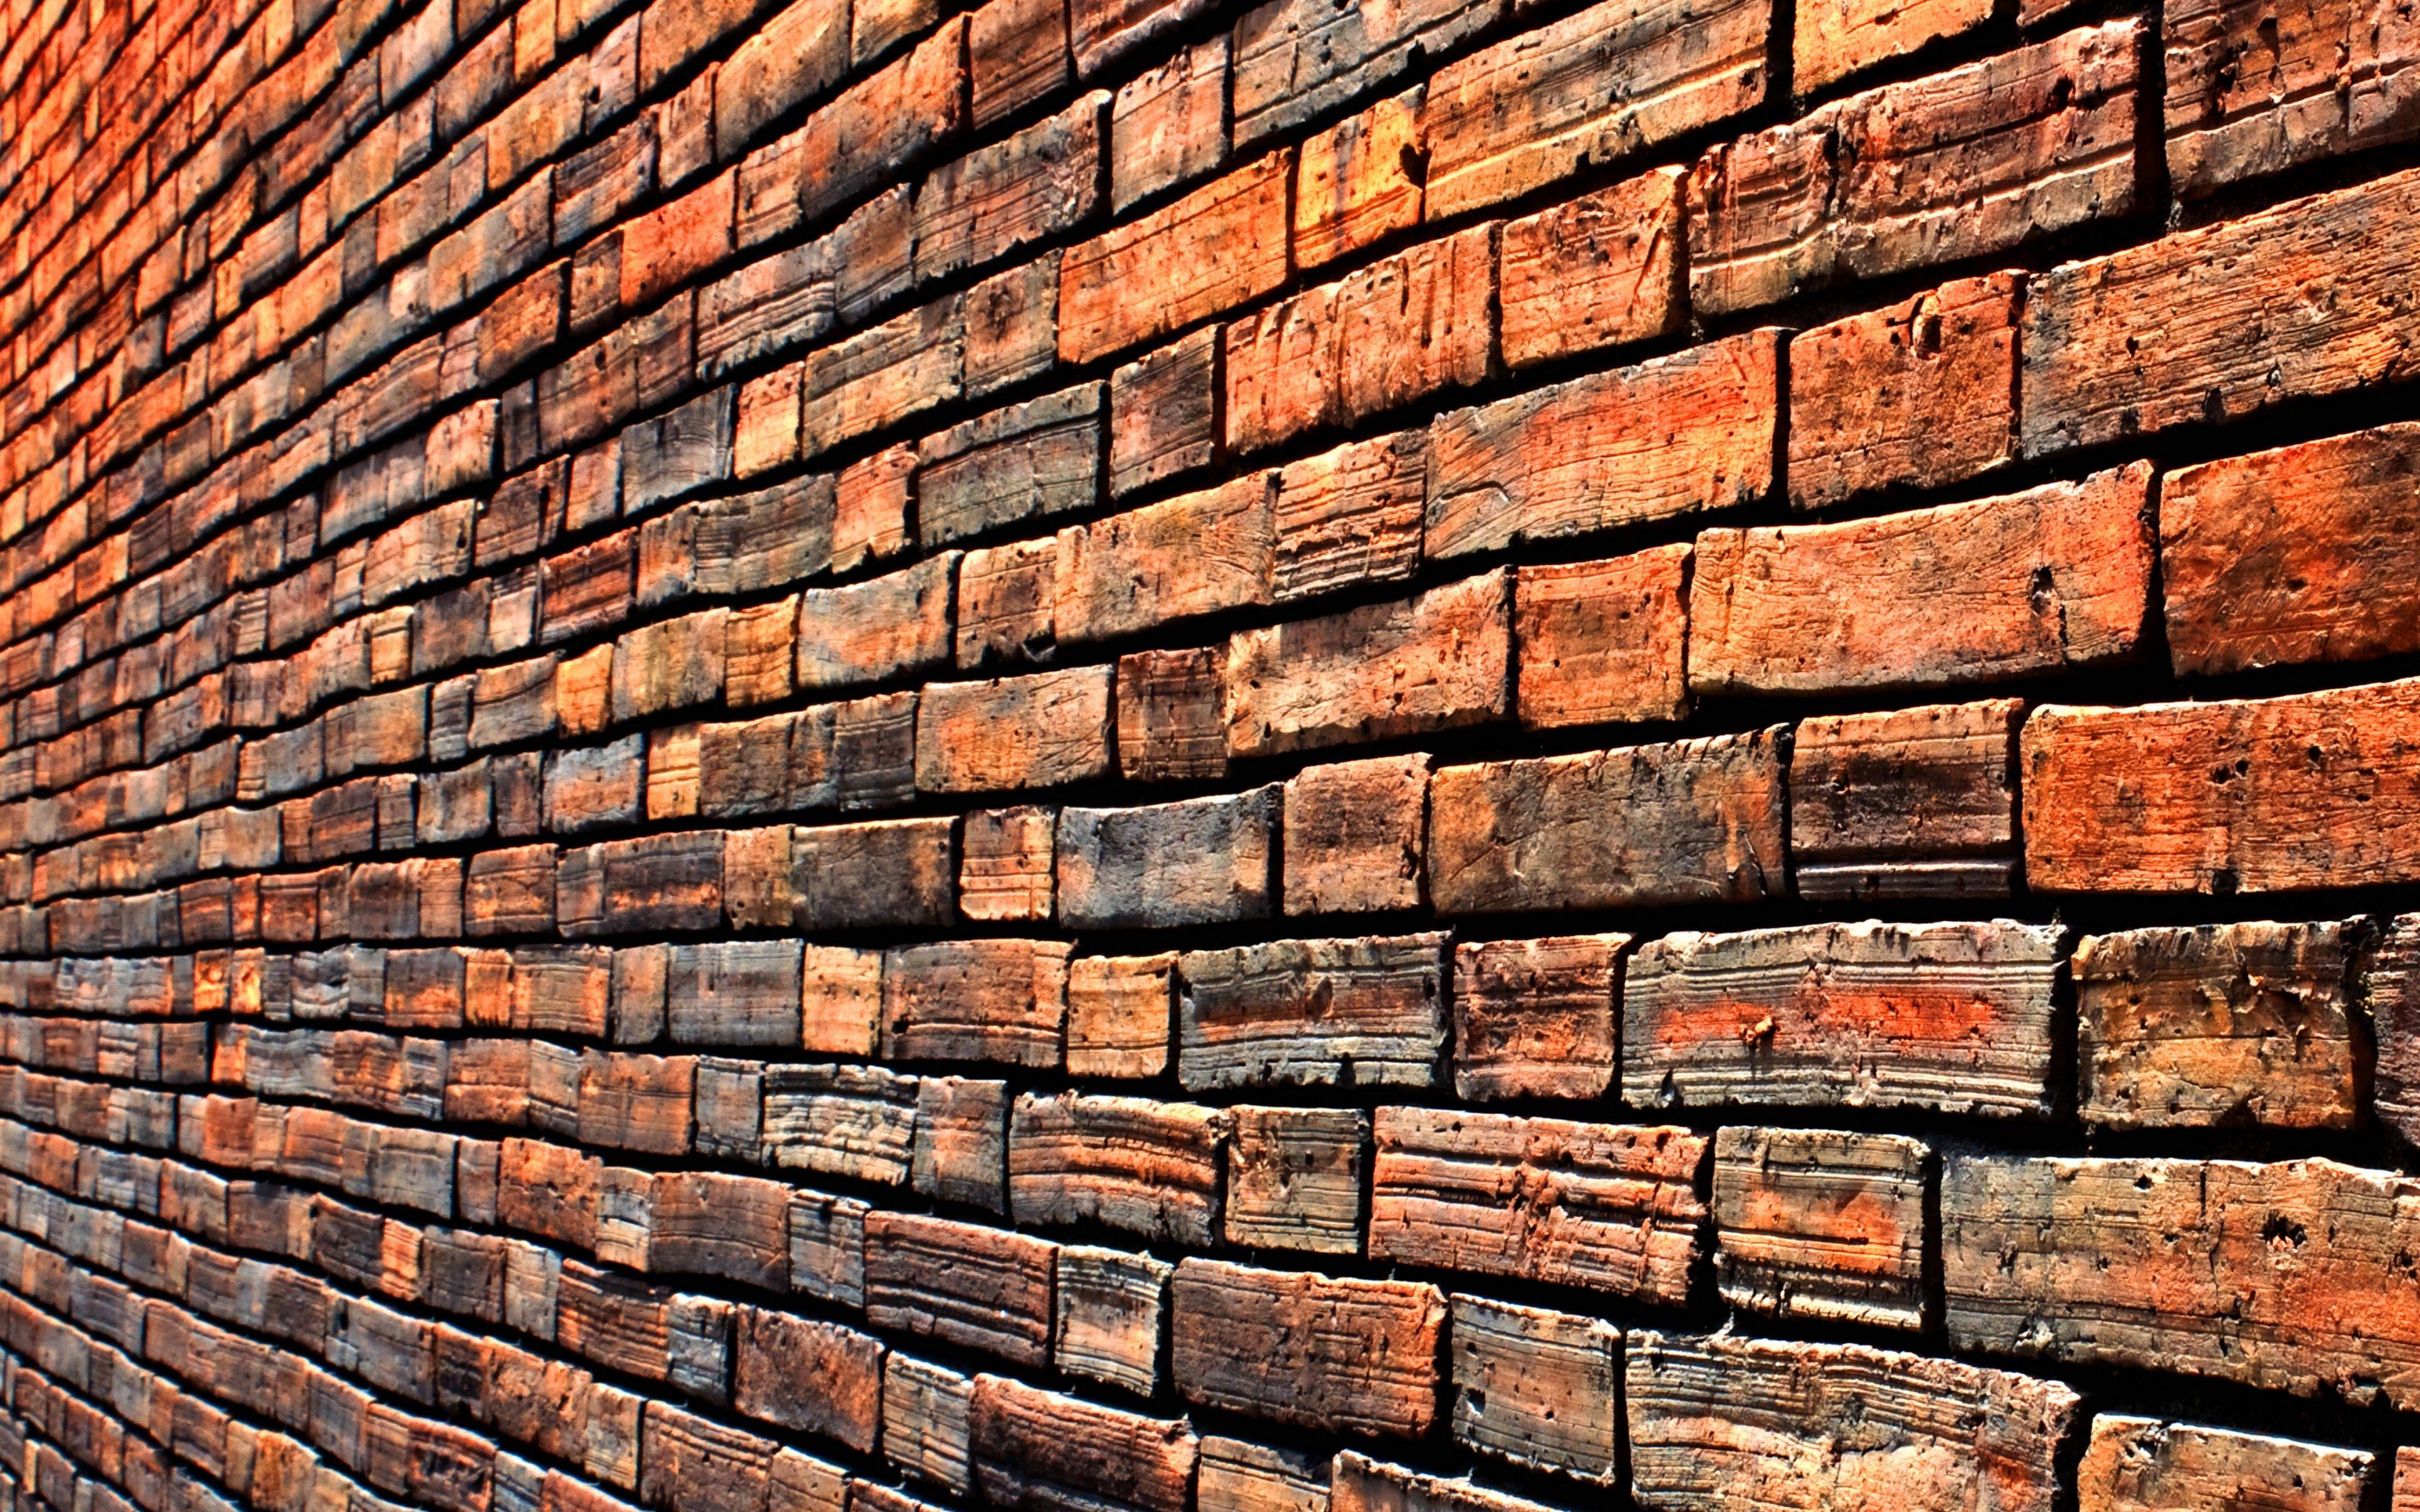 Pin By Panid On Texturas Brick Wallpaper Textured Wallpaper Brick Wall Background